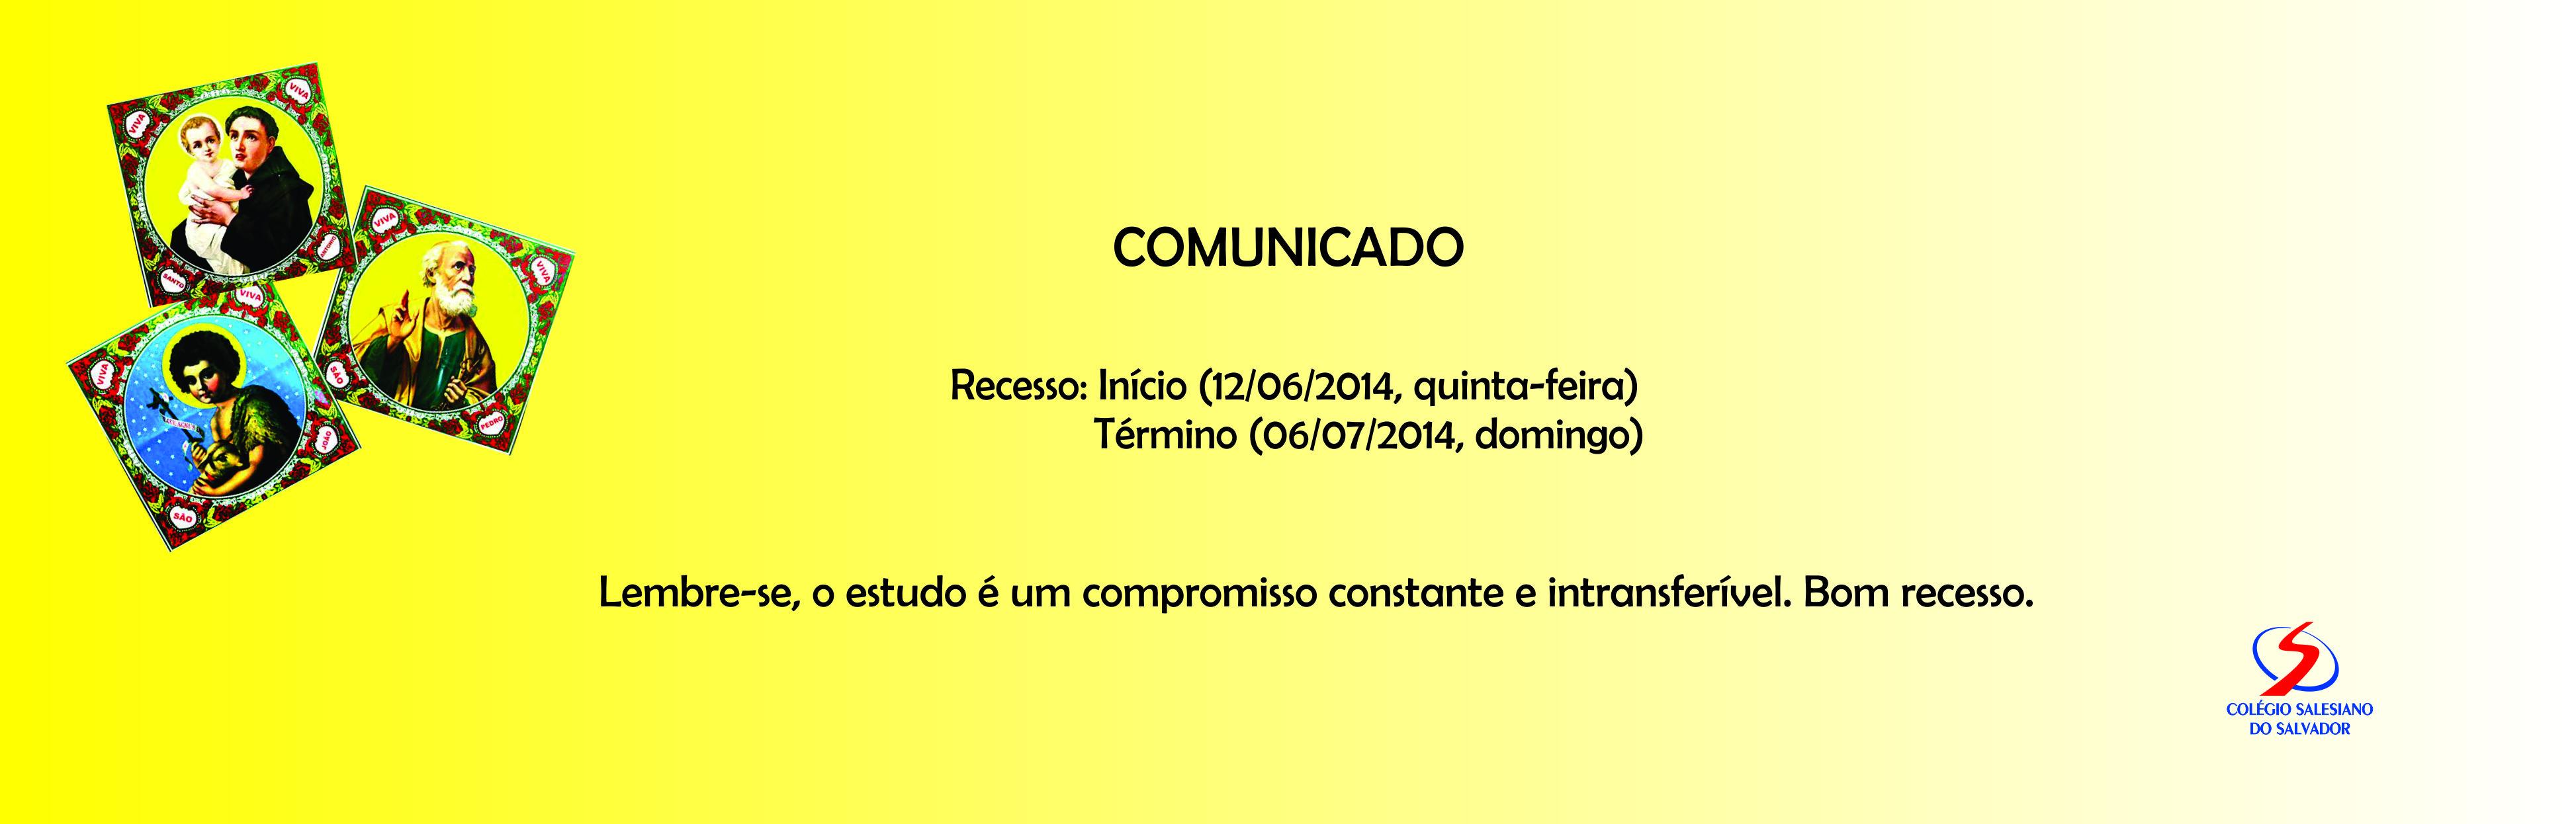 Comunicado_para_face_e_site_atual